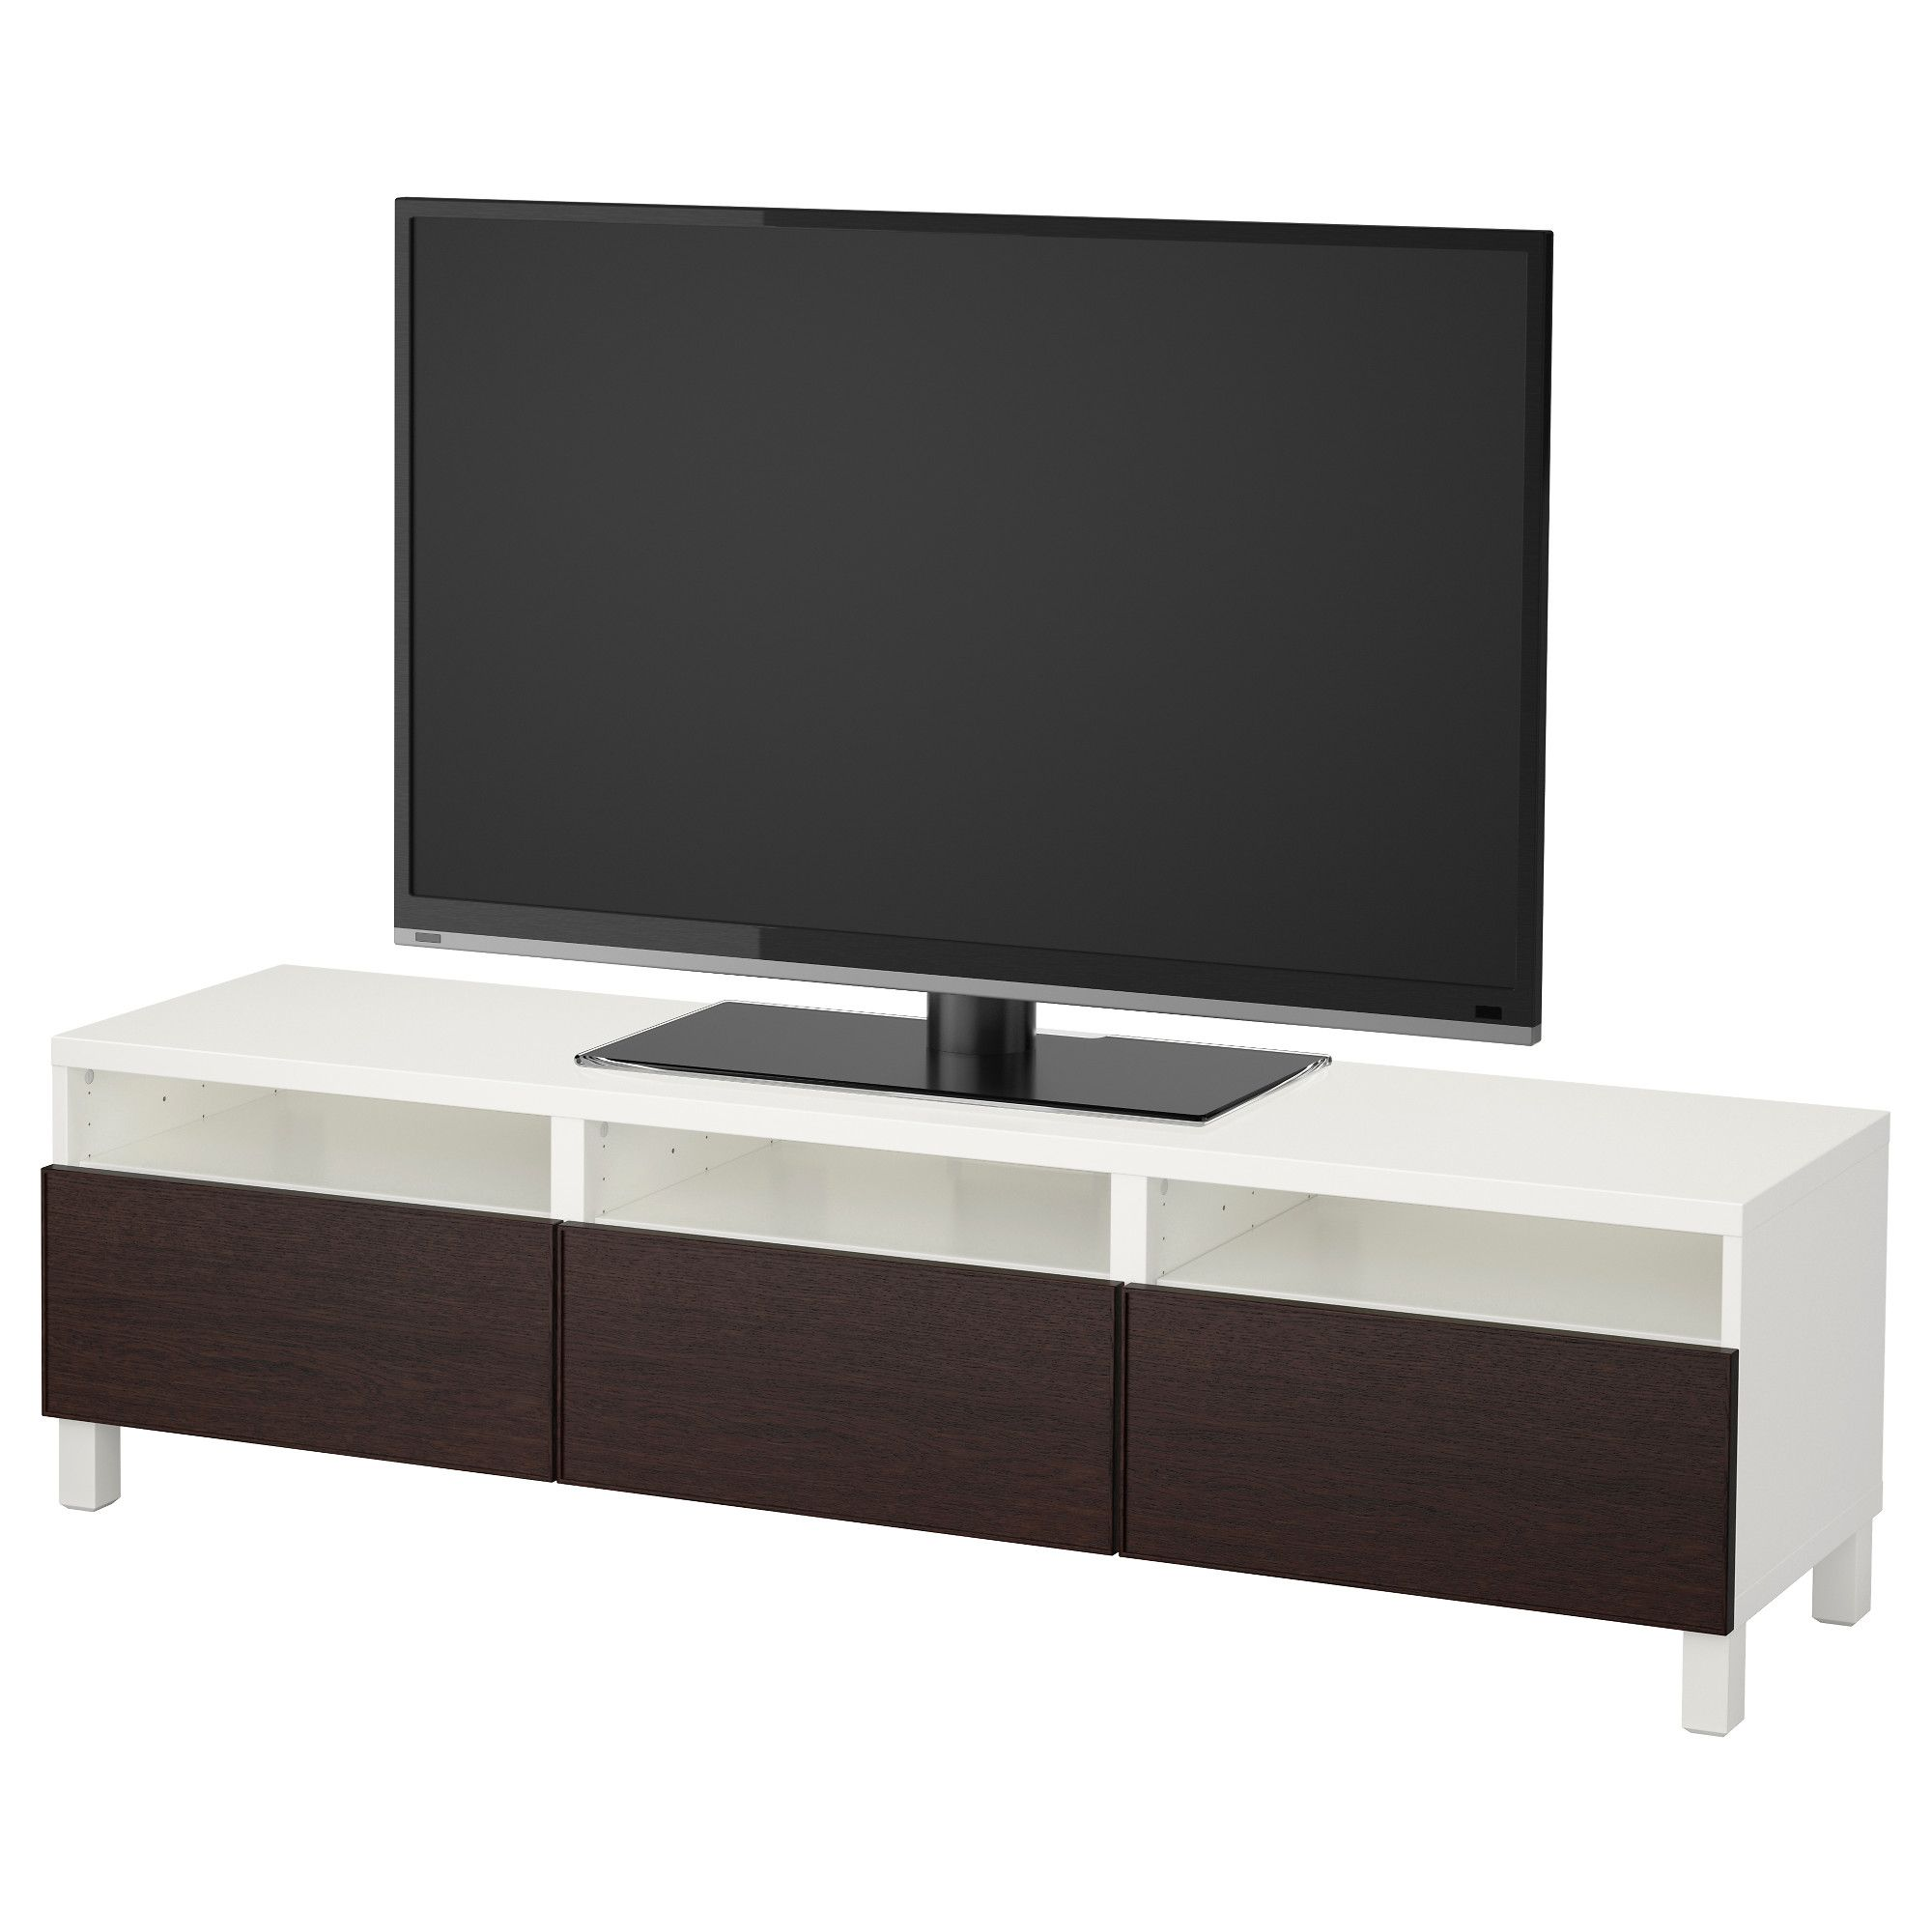 Best Tv Bank Mit Schubladen Wei Schwarzbraun Jetzt Bestellen  # Le Corner Meuble Tv Blanc Led Hi Fi Integre